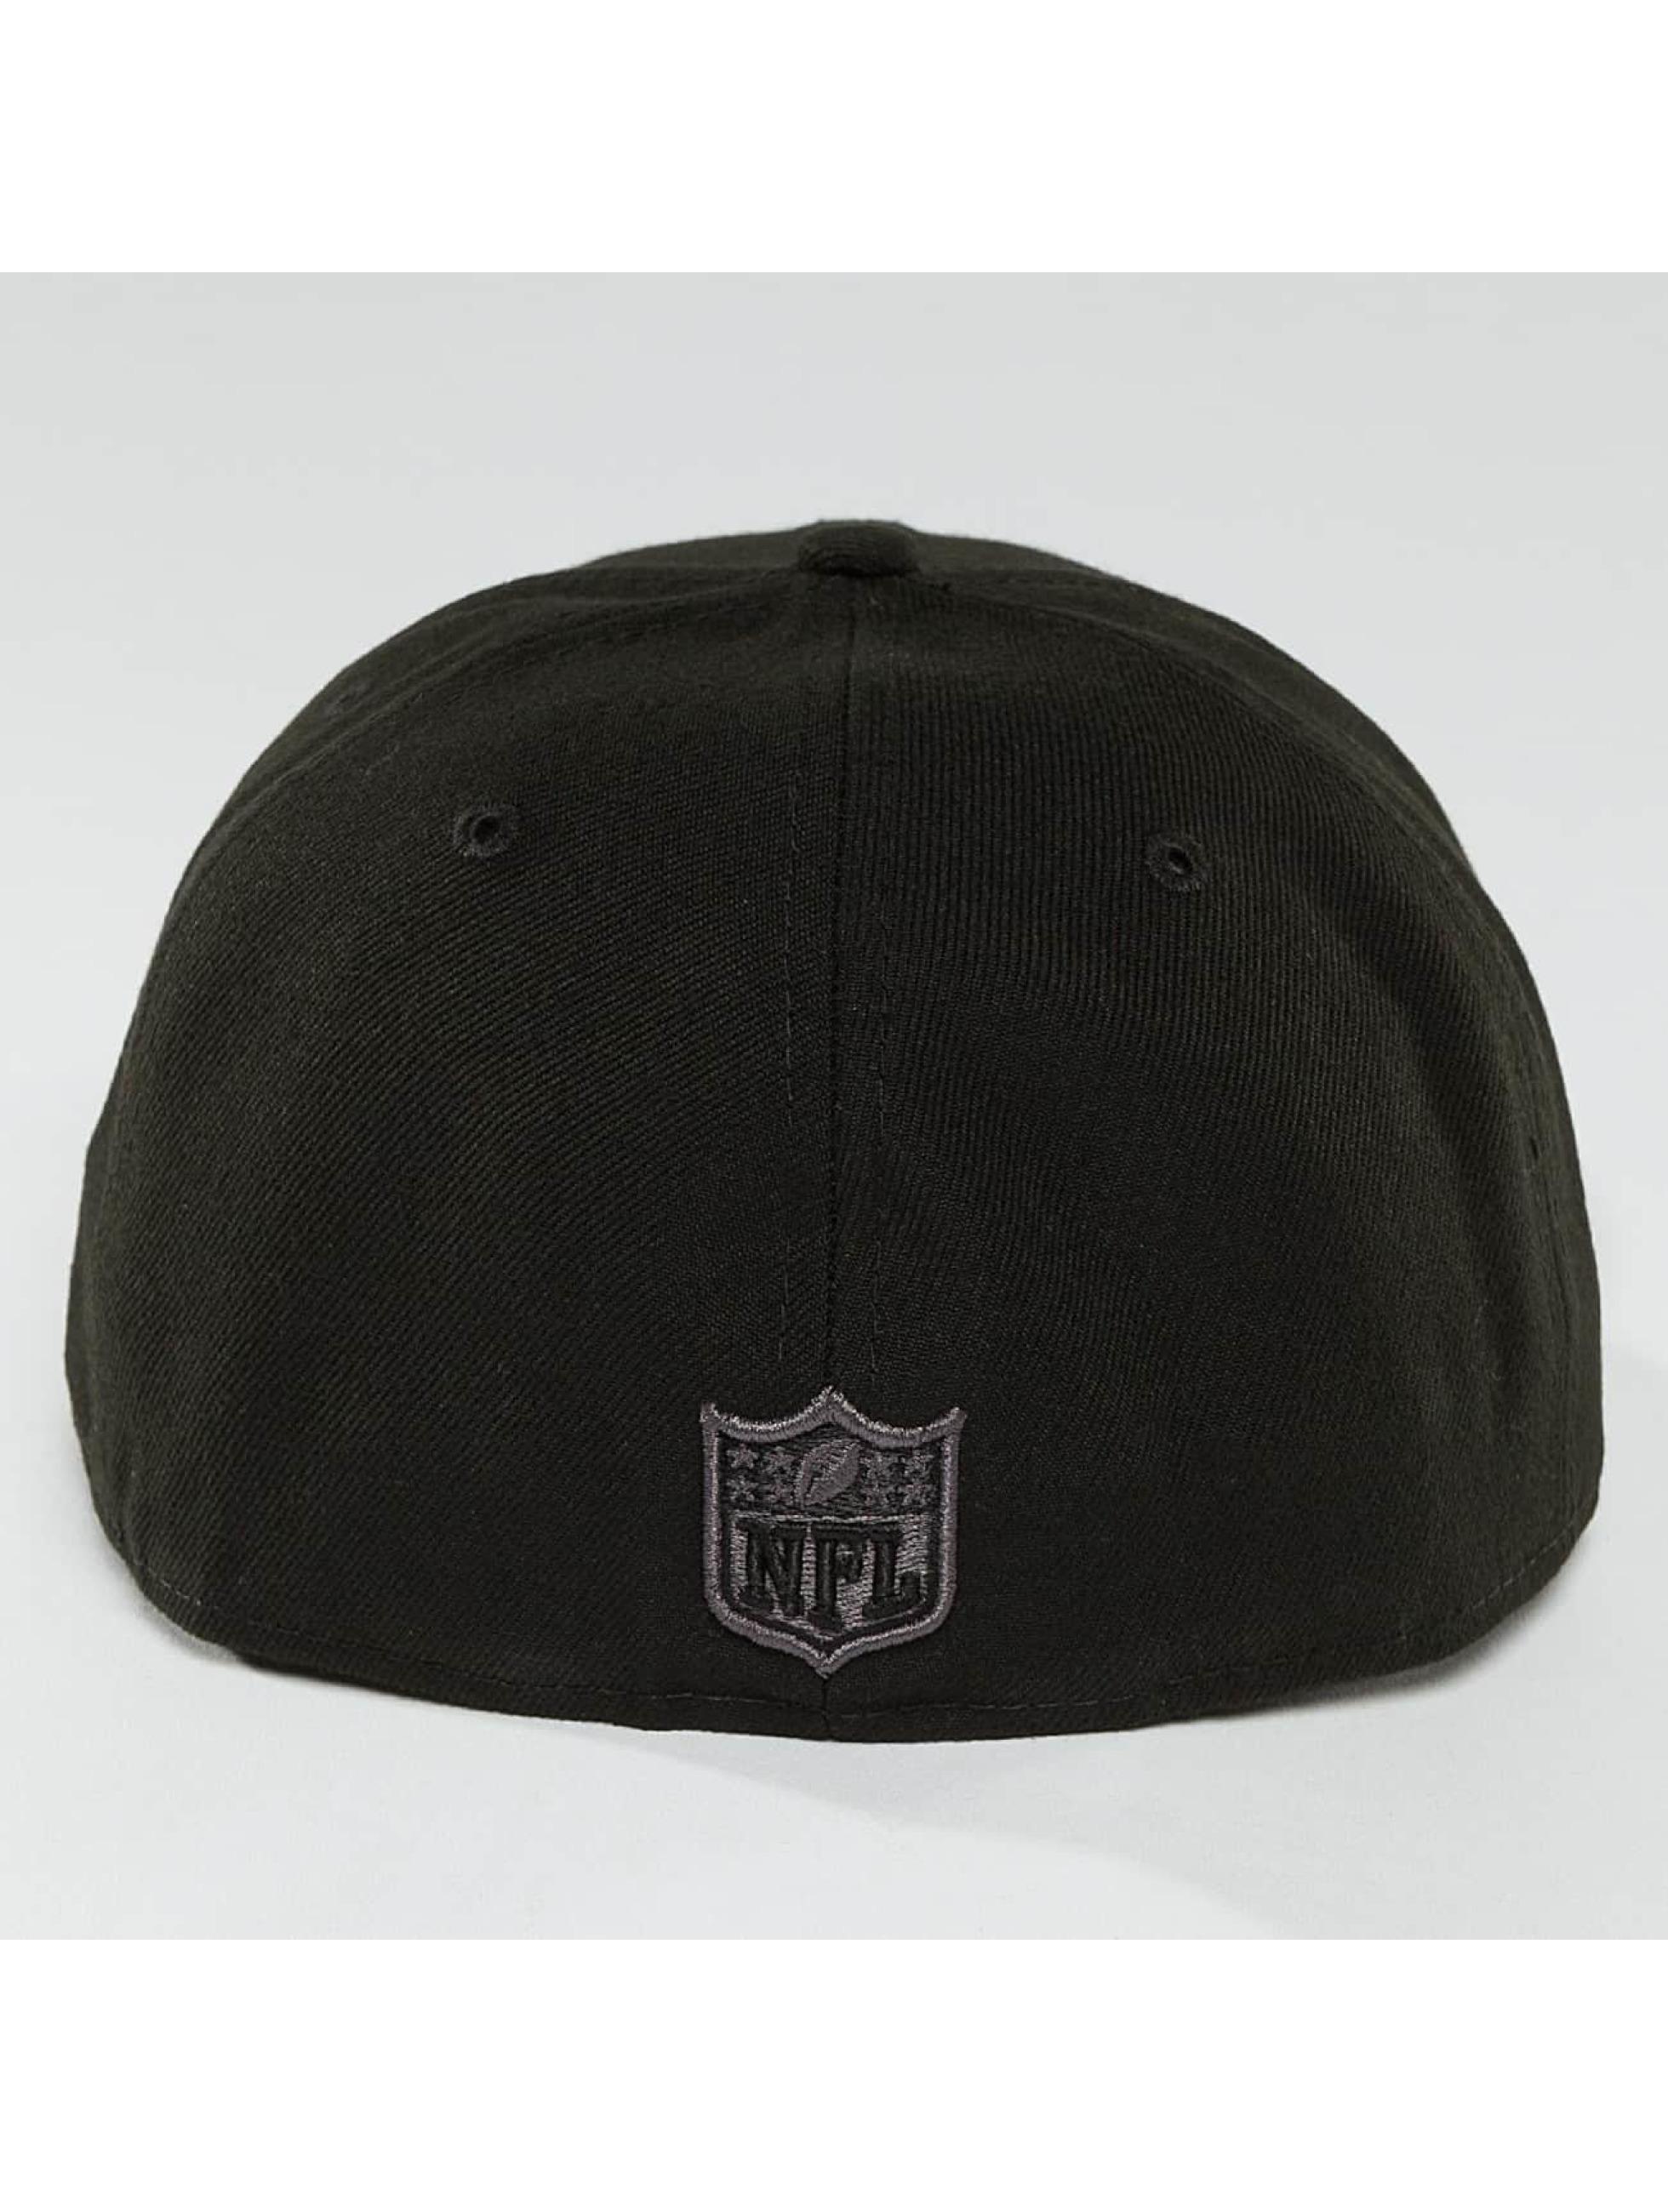 New Era Fitted Cap Black Graphite Oakland Raiders 59Fifty black